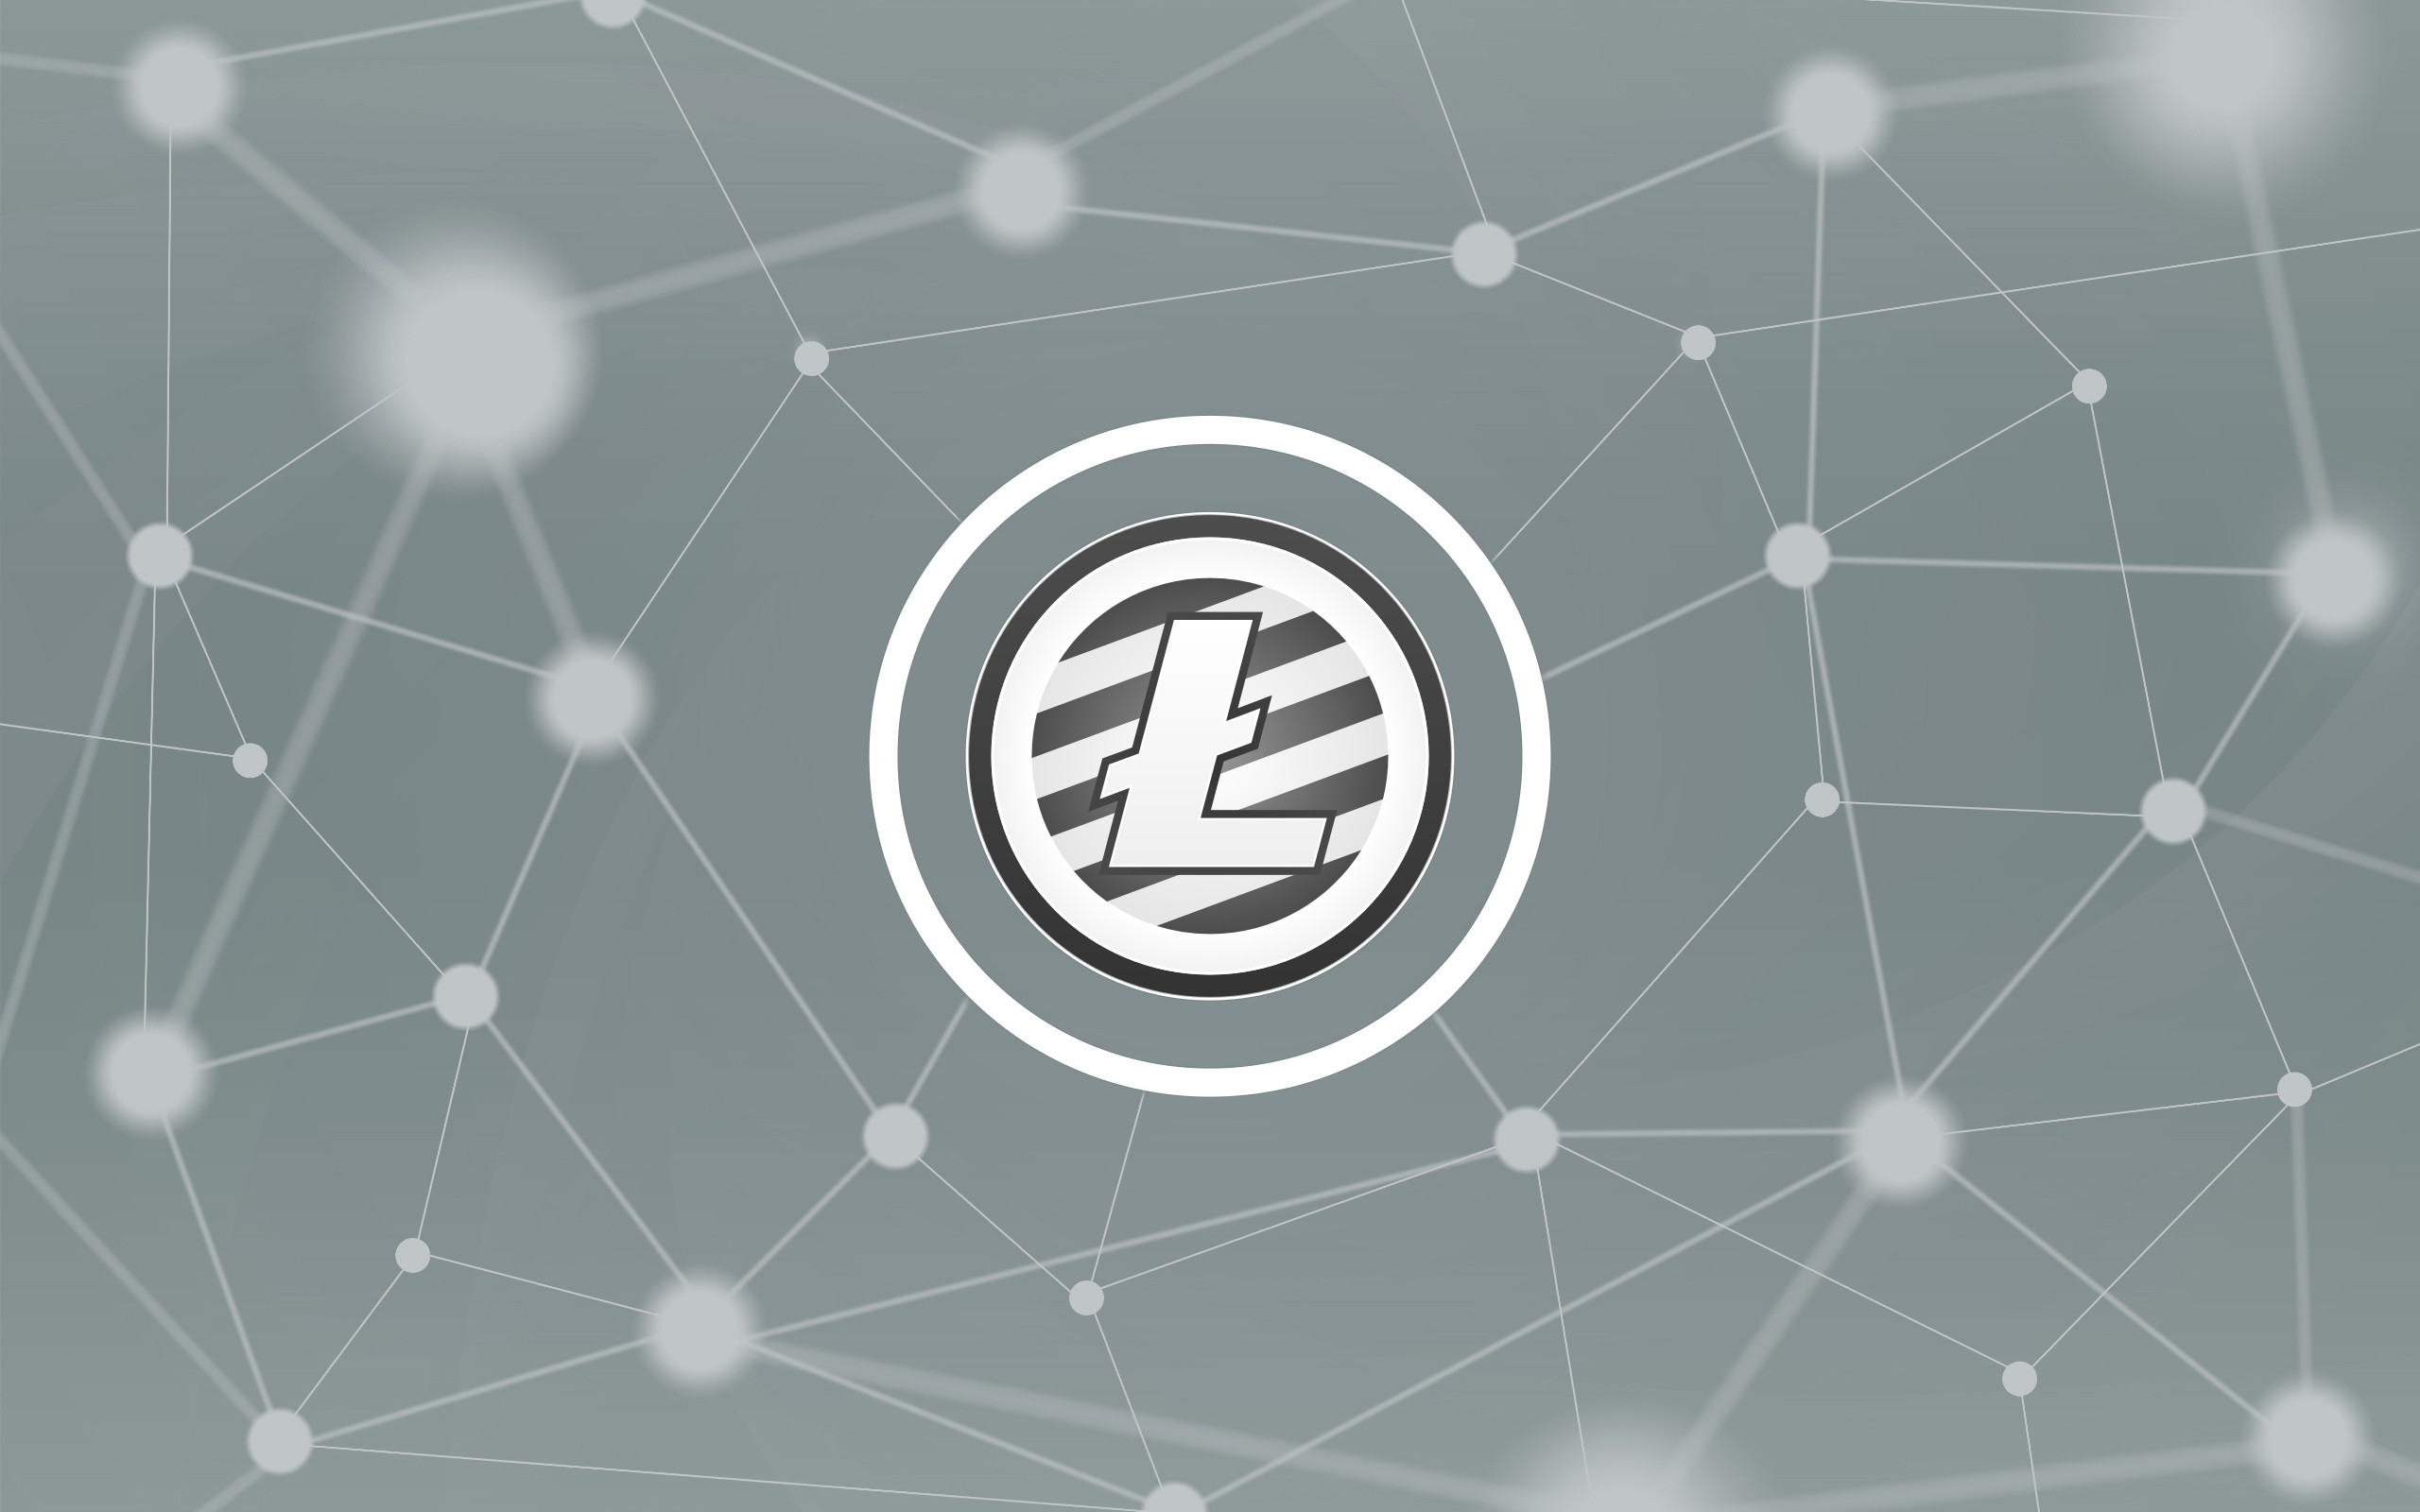 Webbot(ウェブボット) 仮想通貨 相場